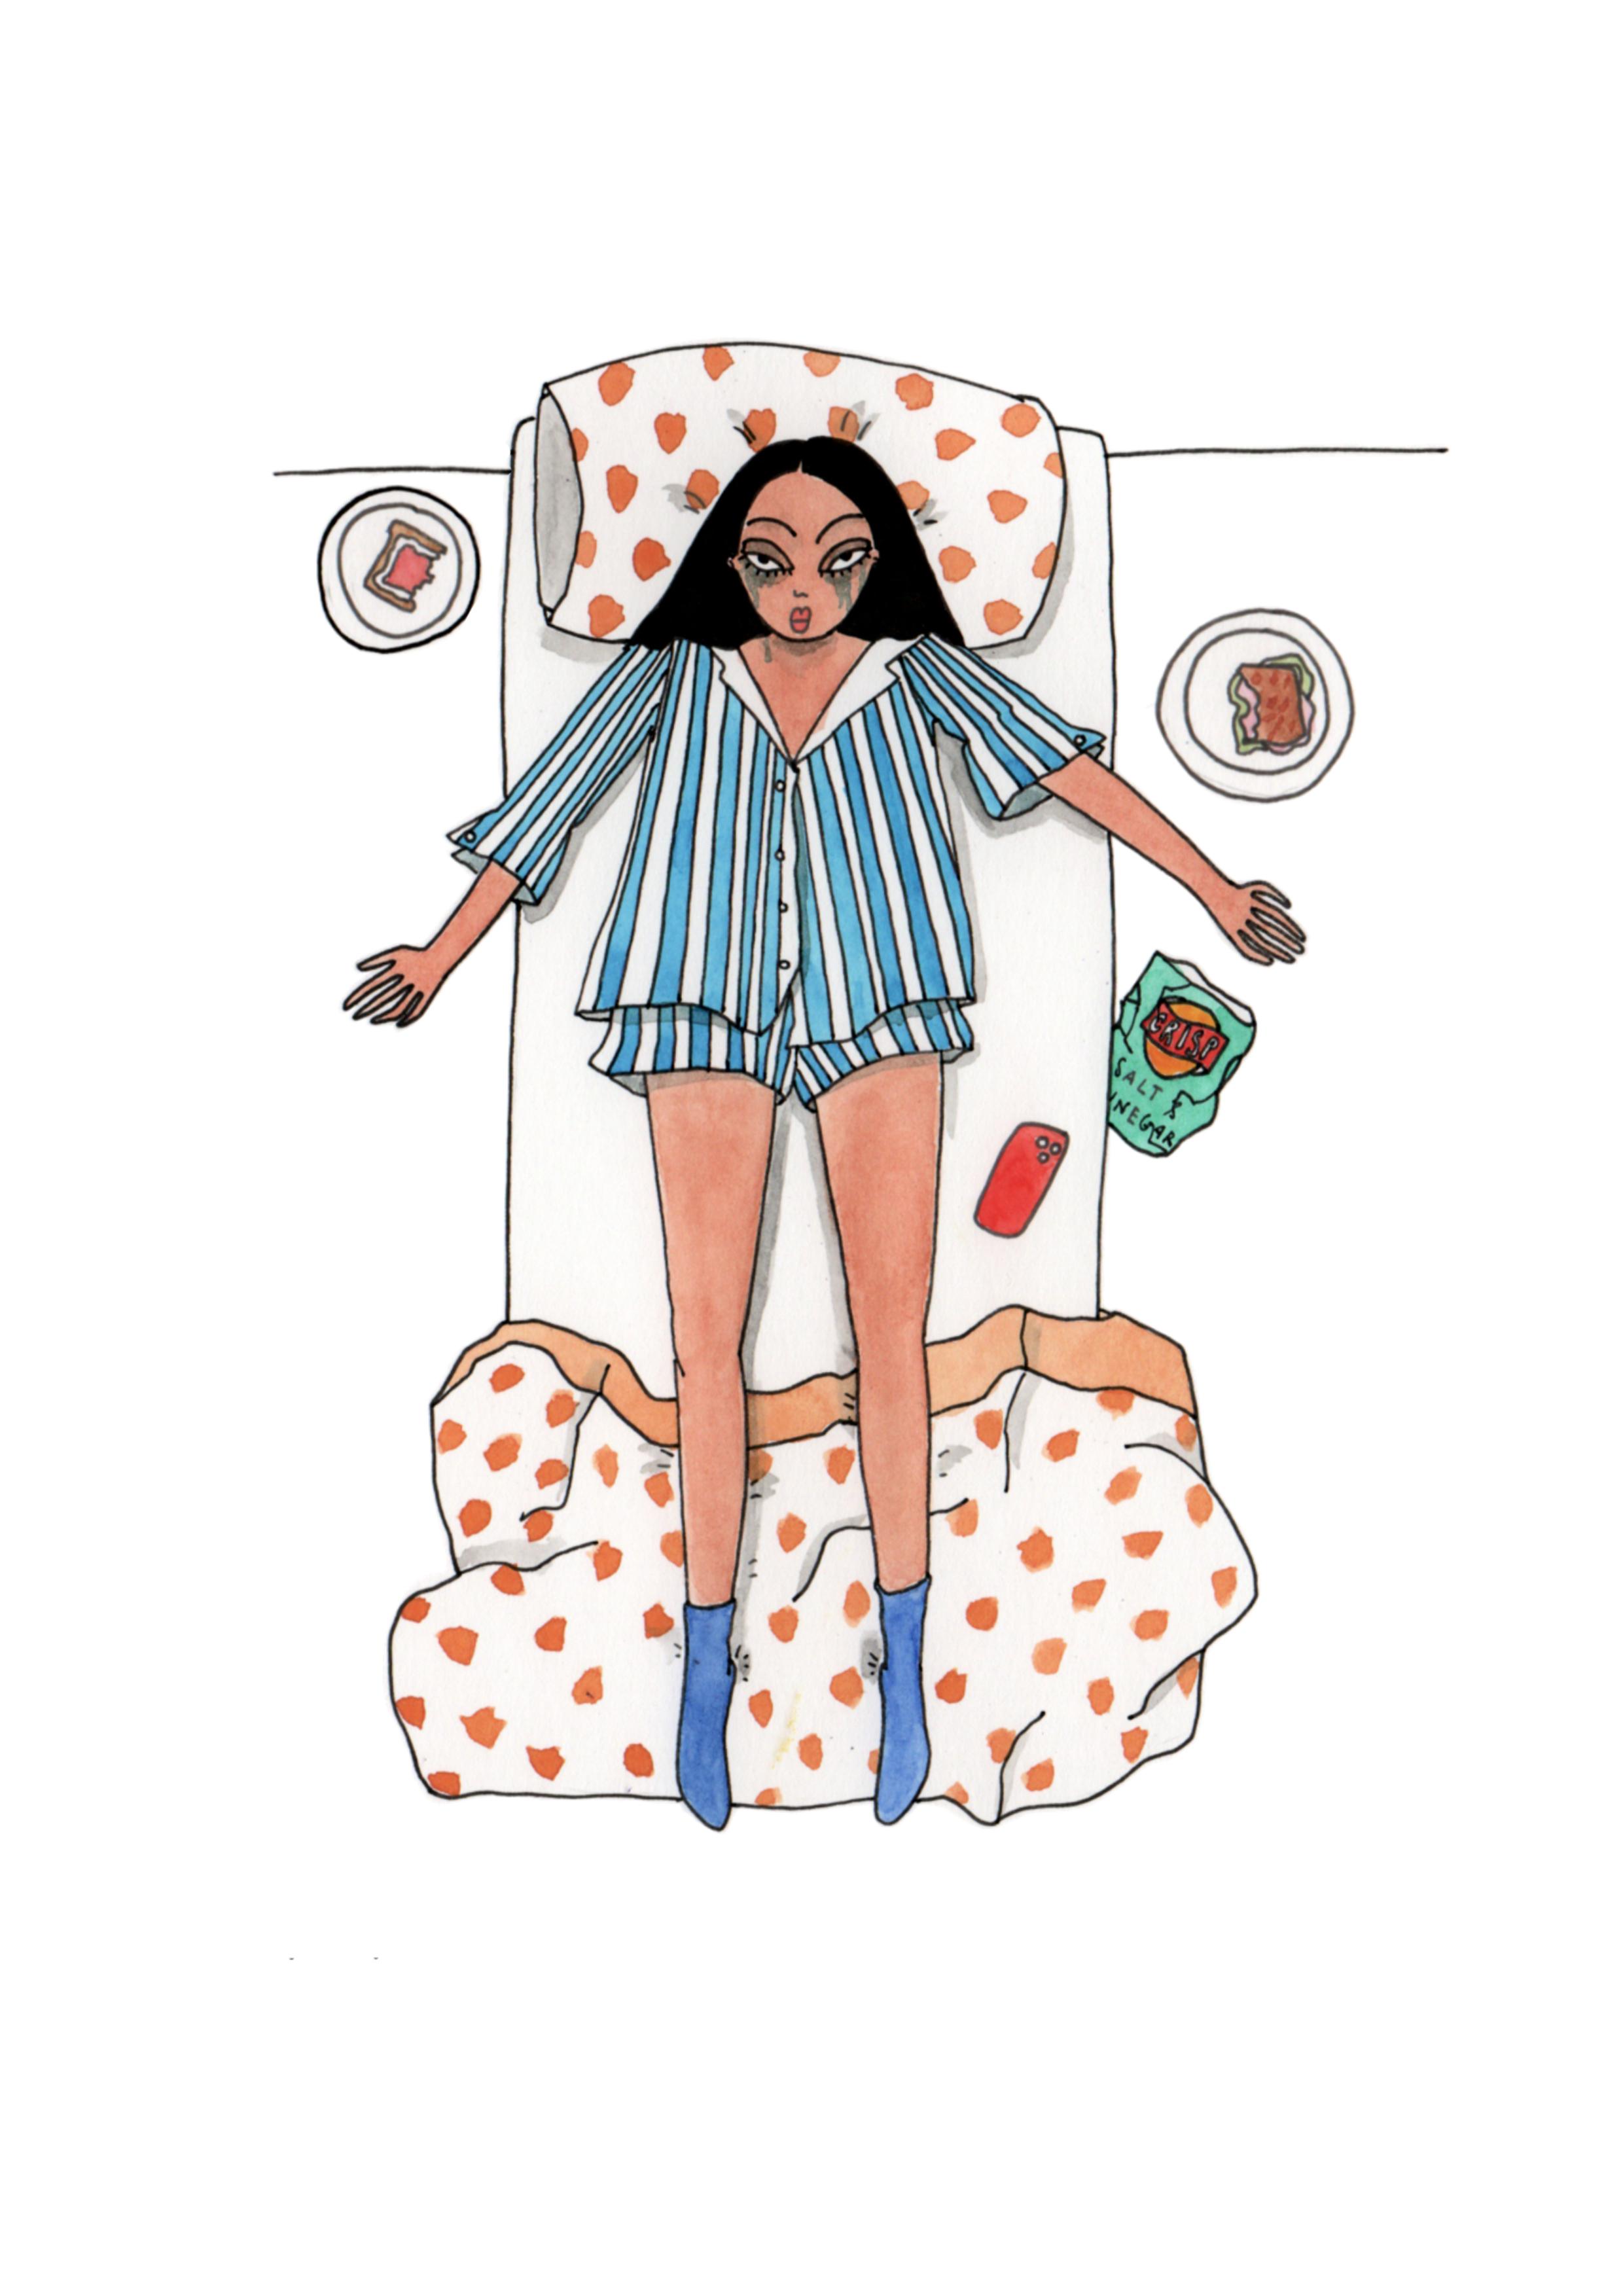 Emma Allegretti - self discipline is really hard (courtesy of the artist)